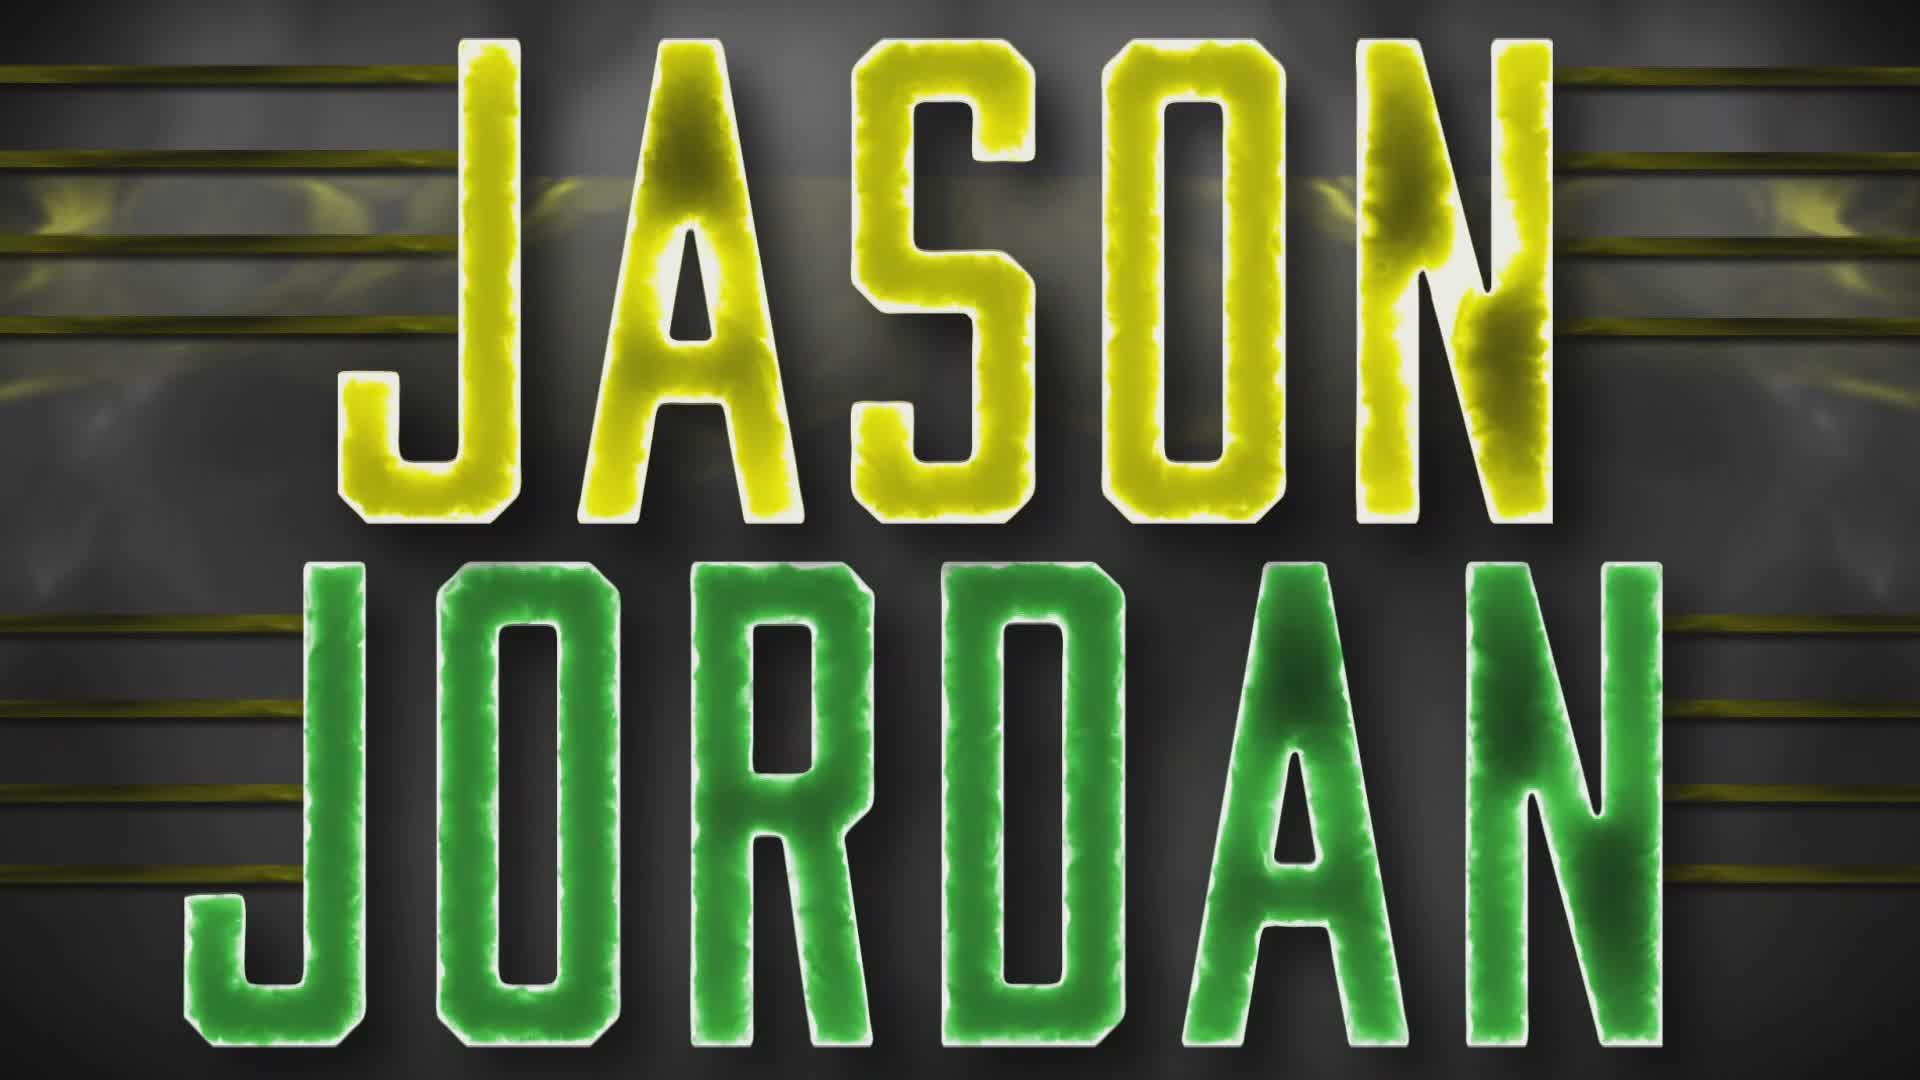 Jason Jordan Entrance Video